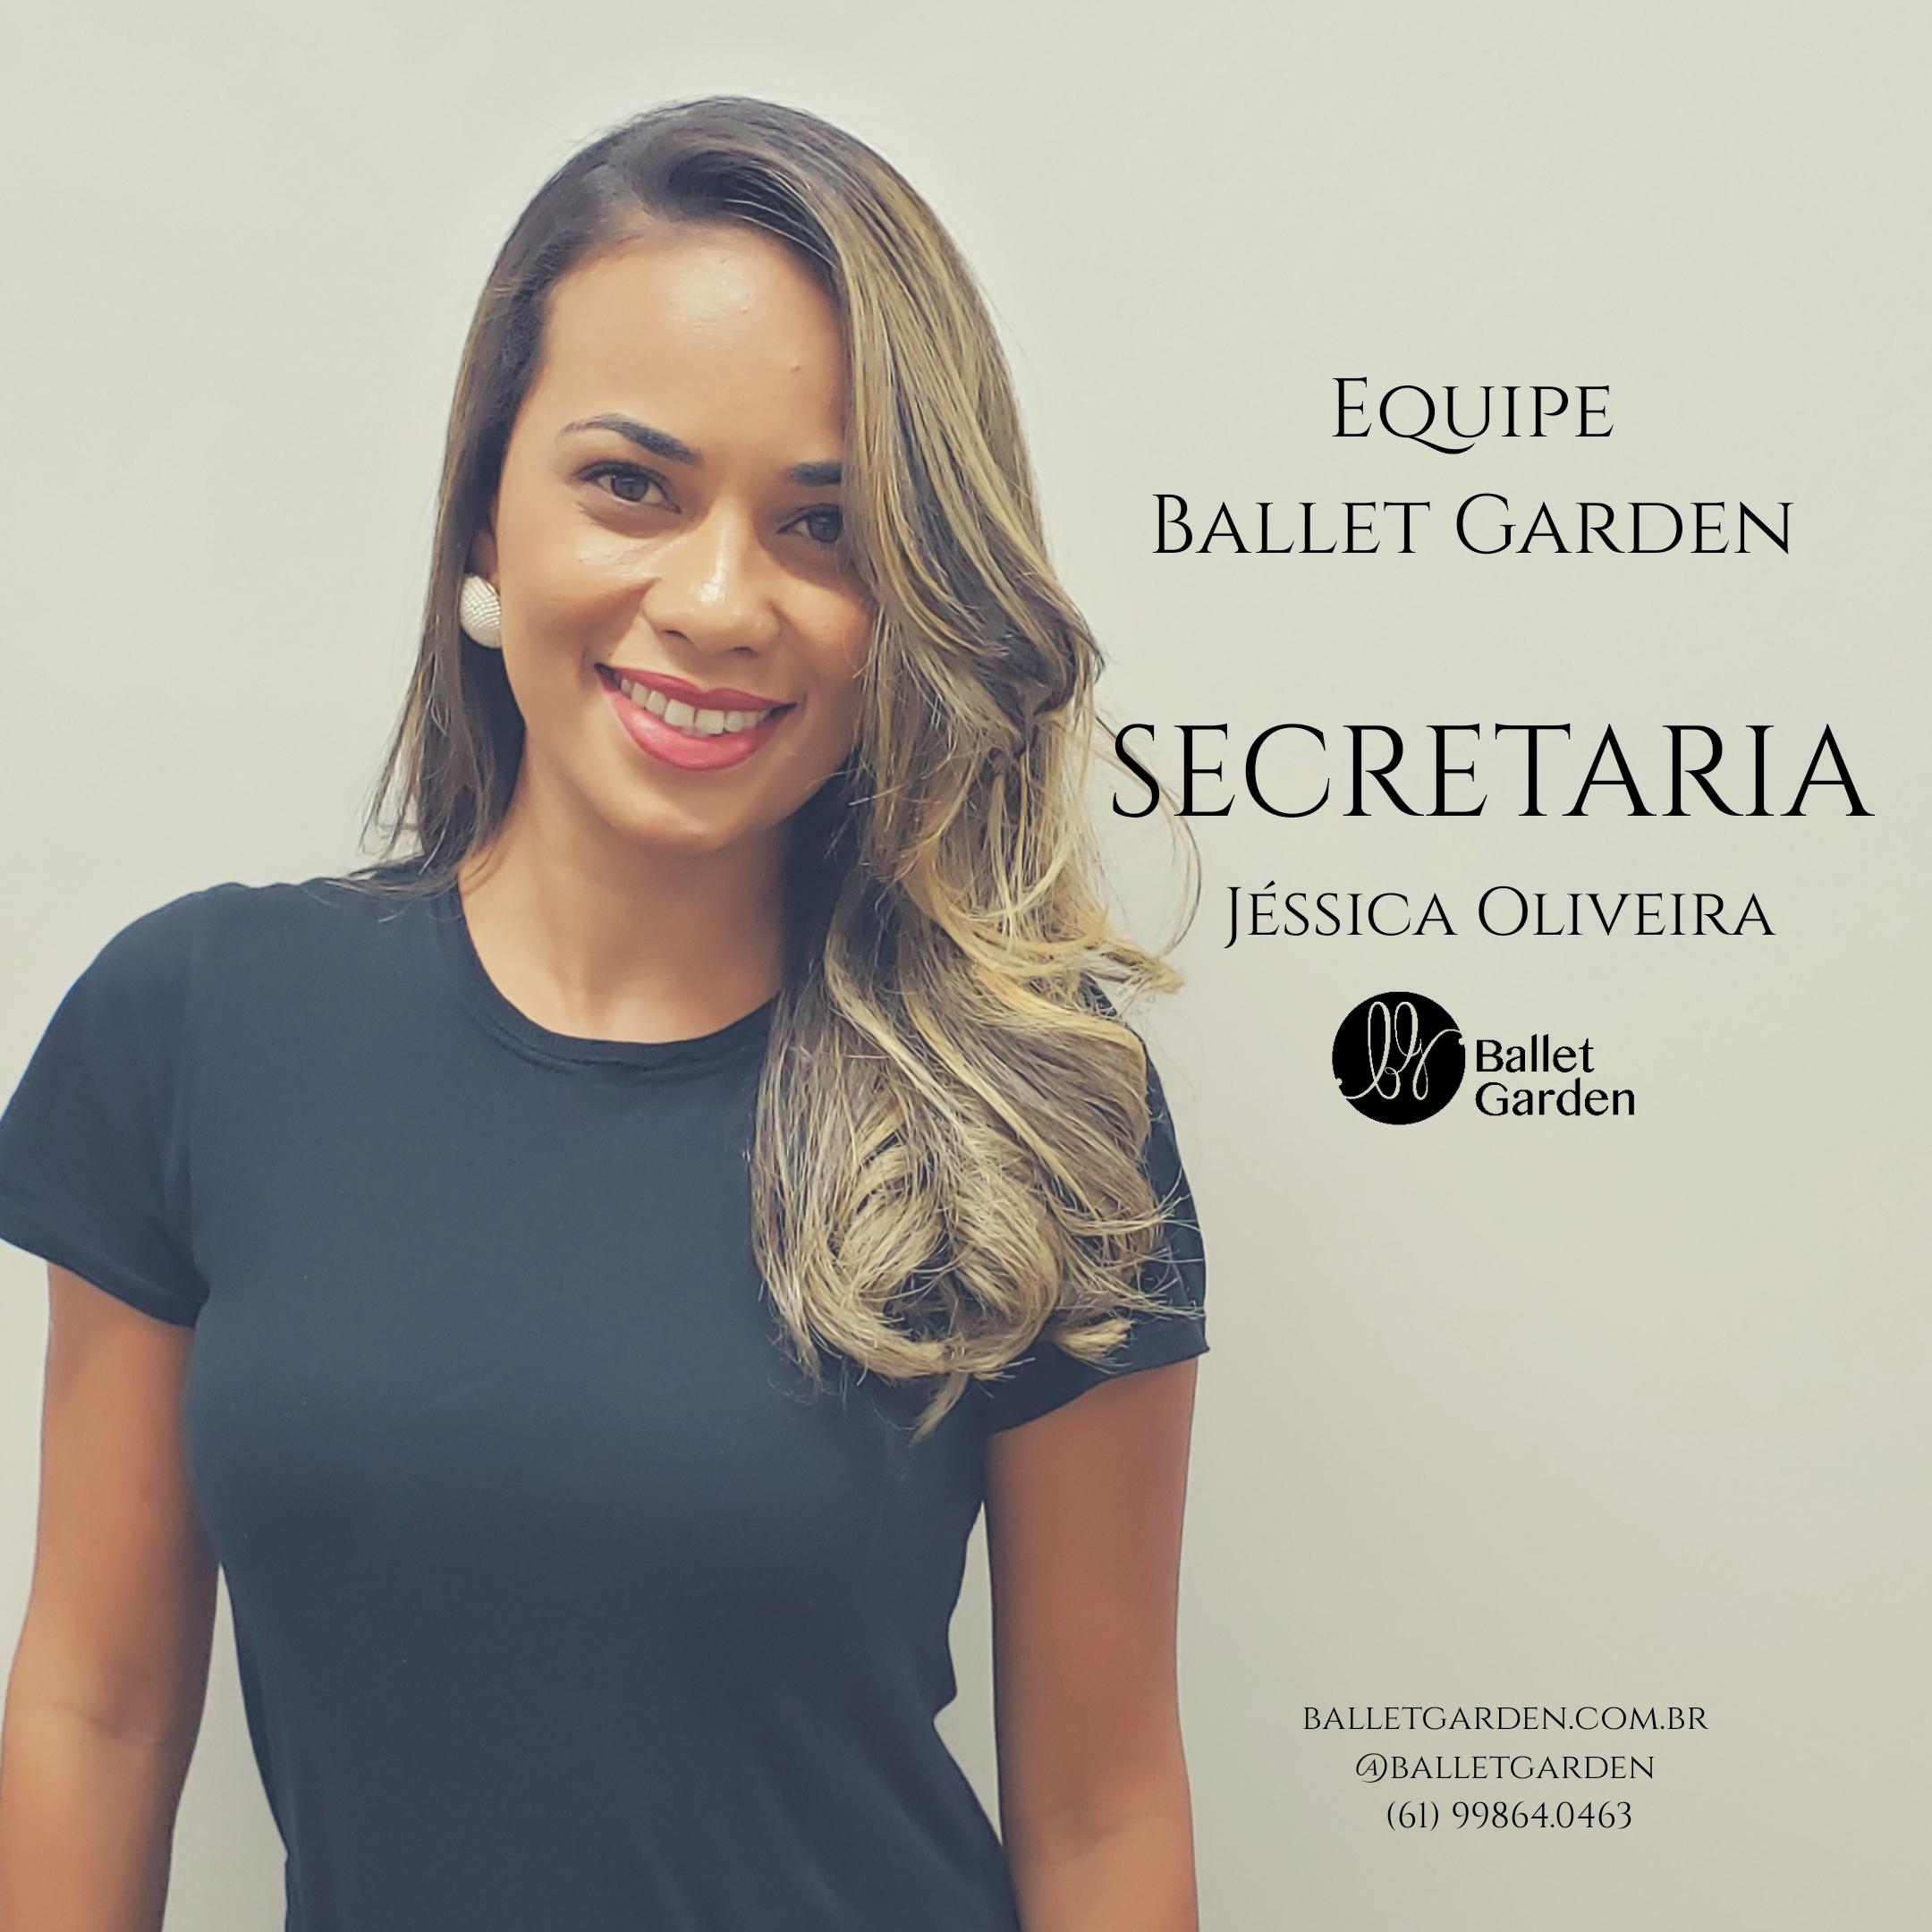 Secretaria Jéssica Oliveira